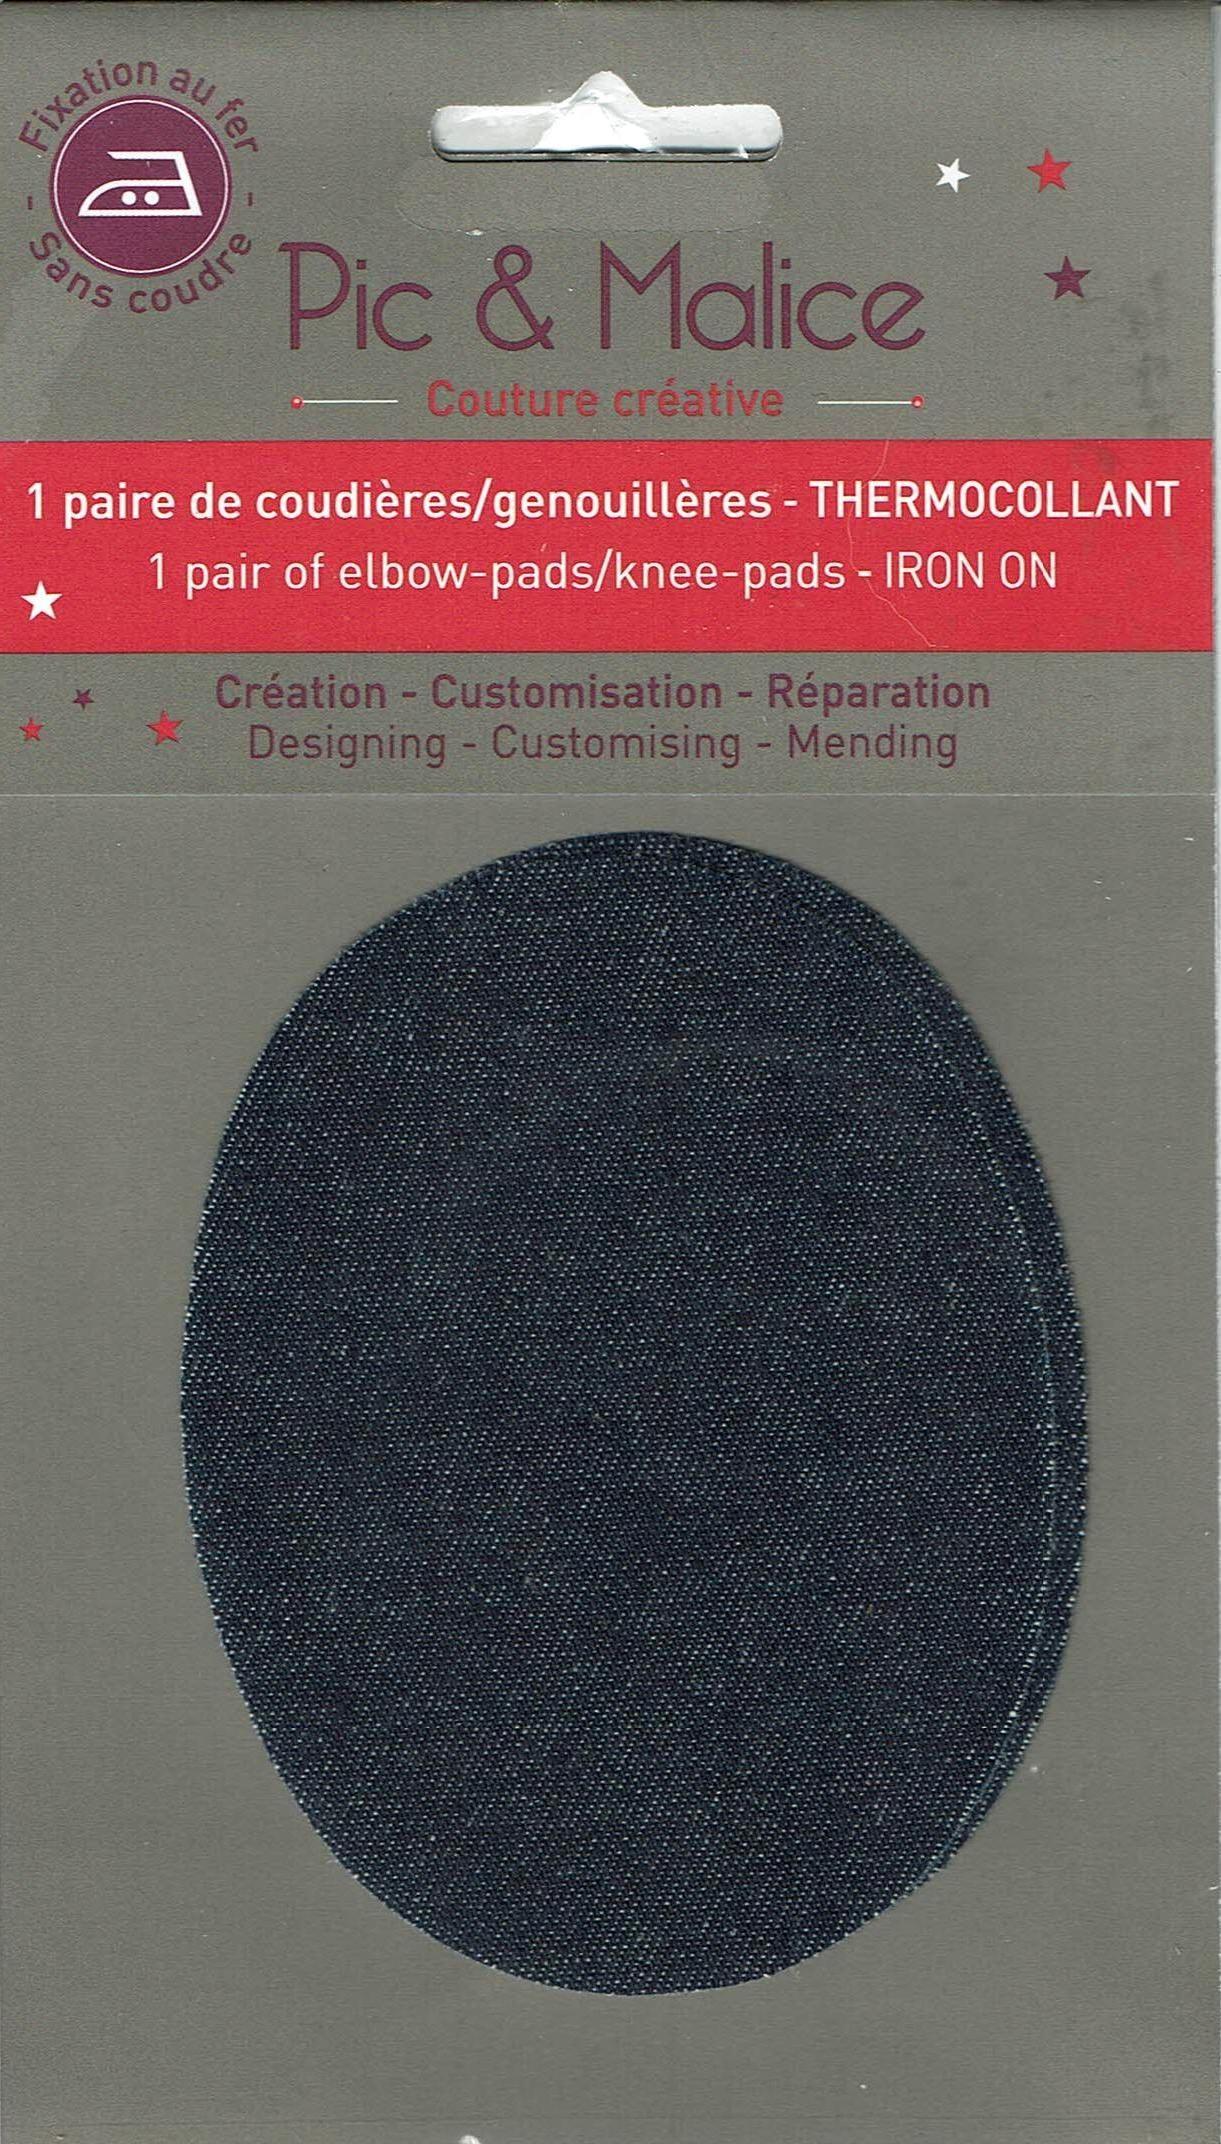 4 Thermocollant 5038 (7,4 x 9,6)